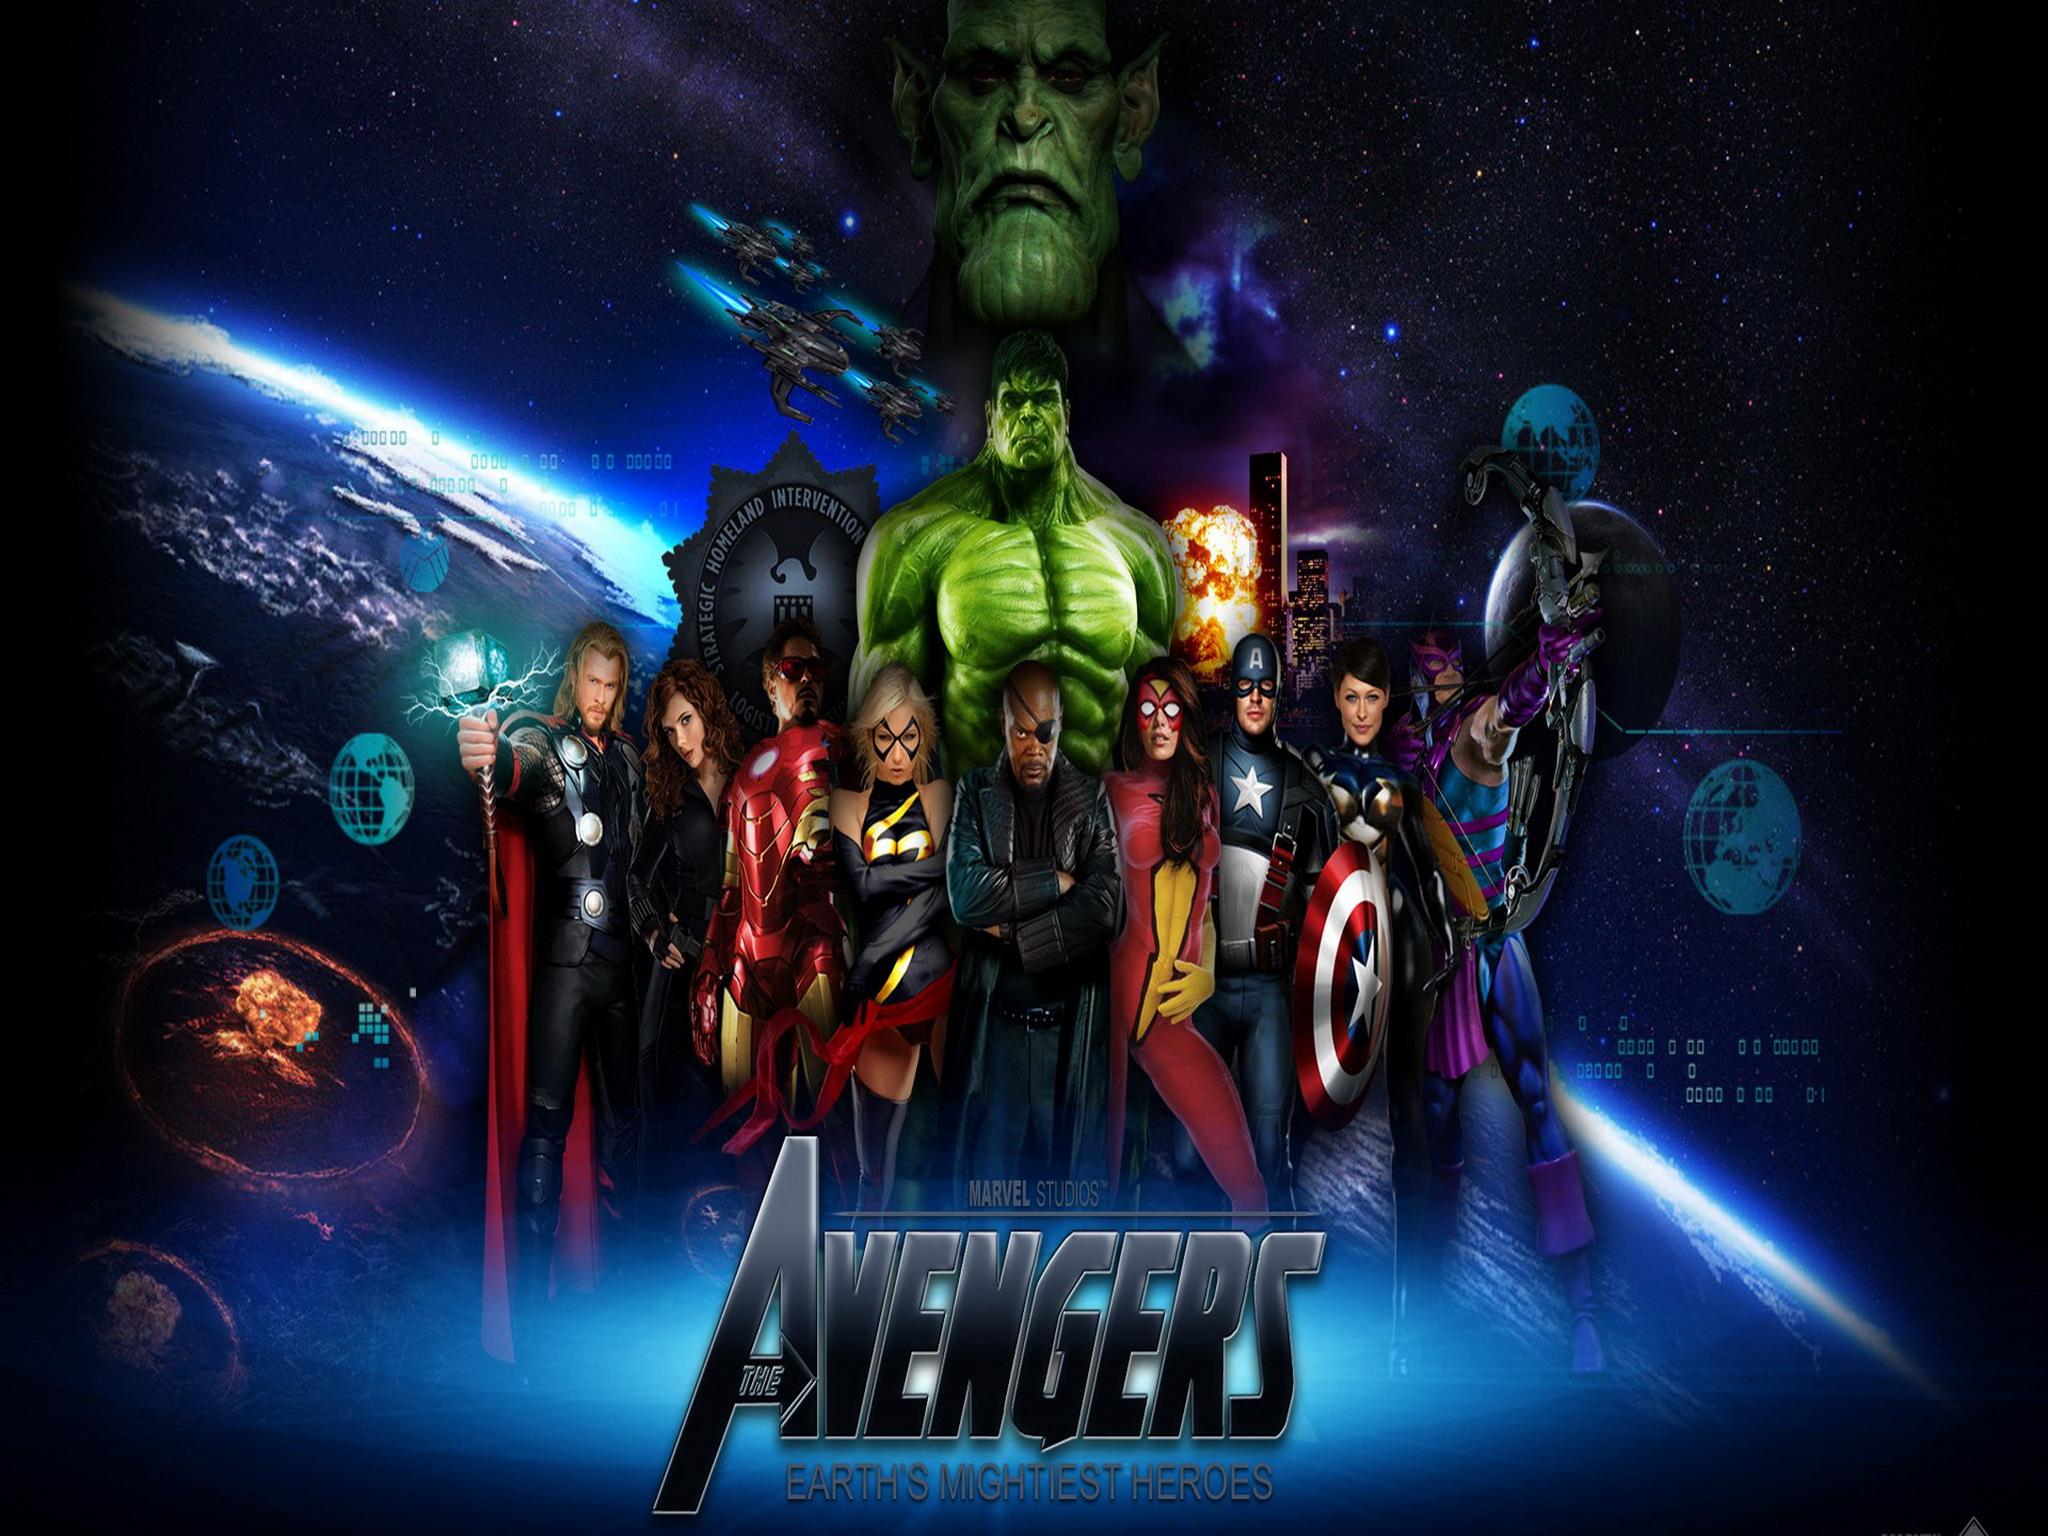 Avengers IPad Wallpaper